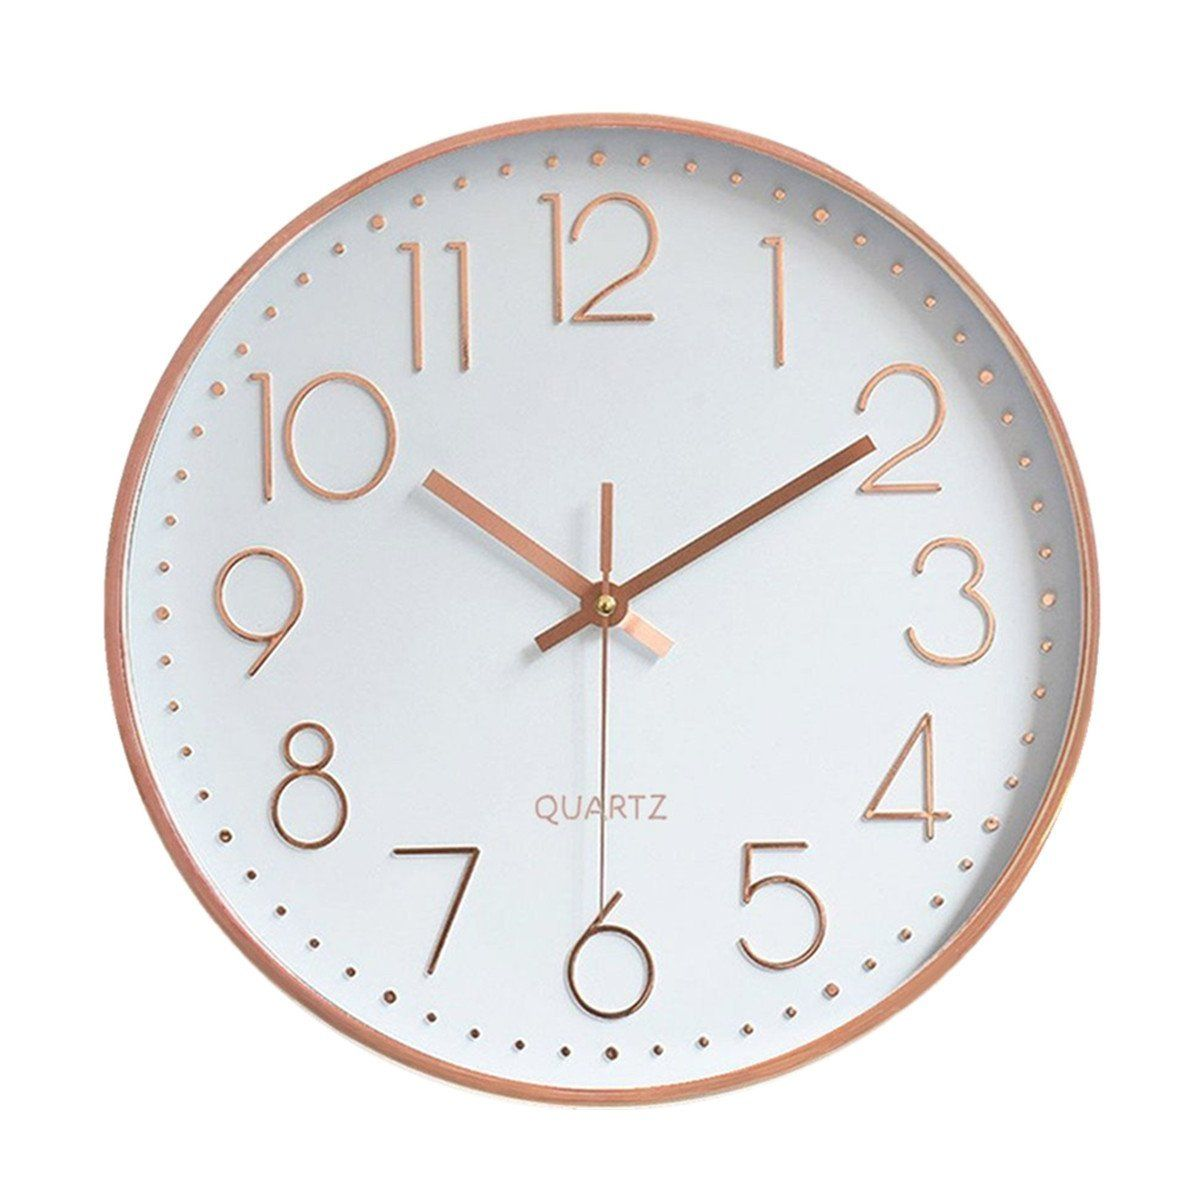 46+ Living room wall clocks amazon information